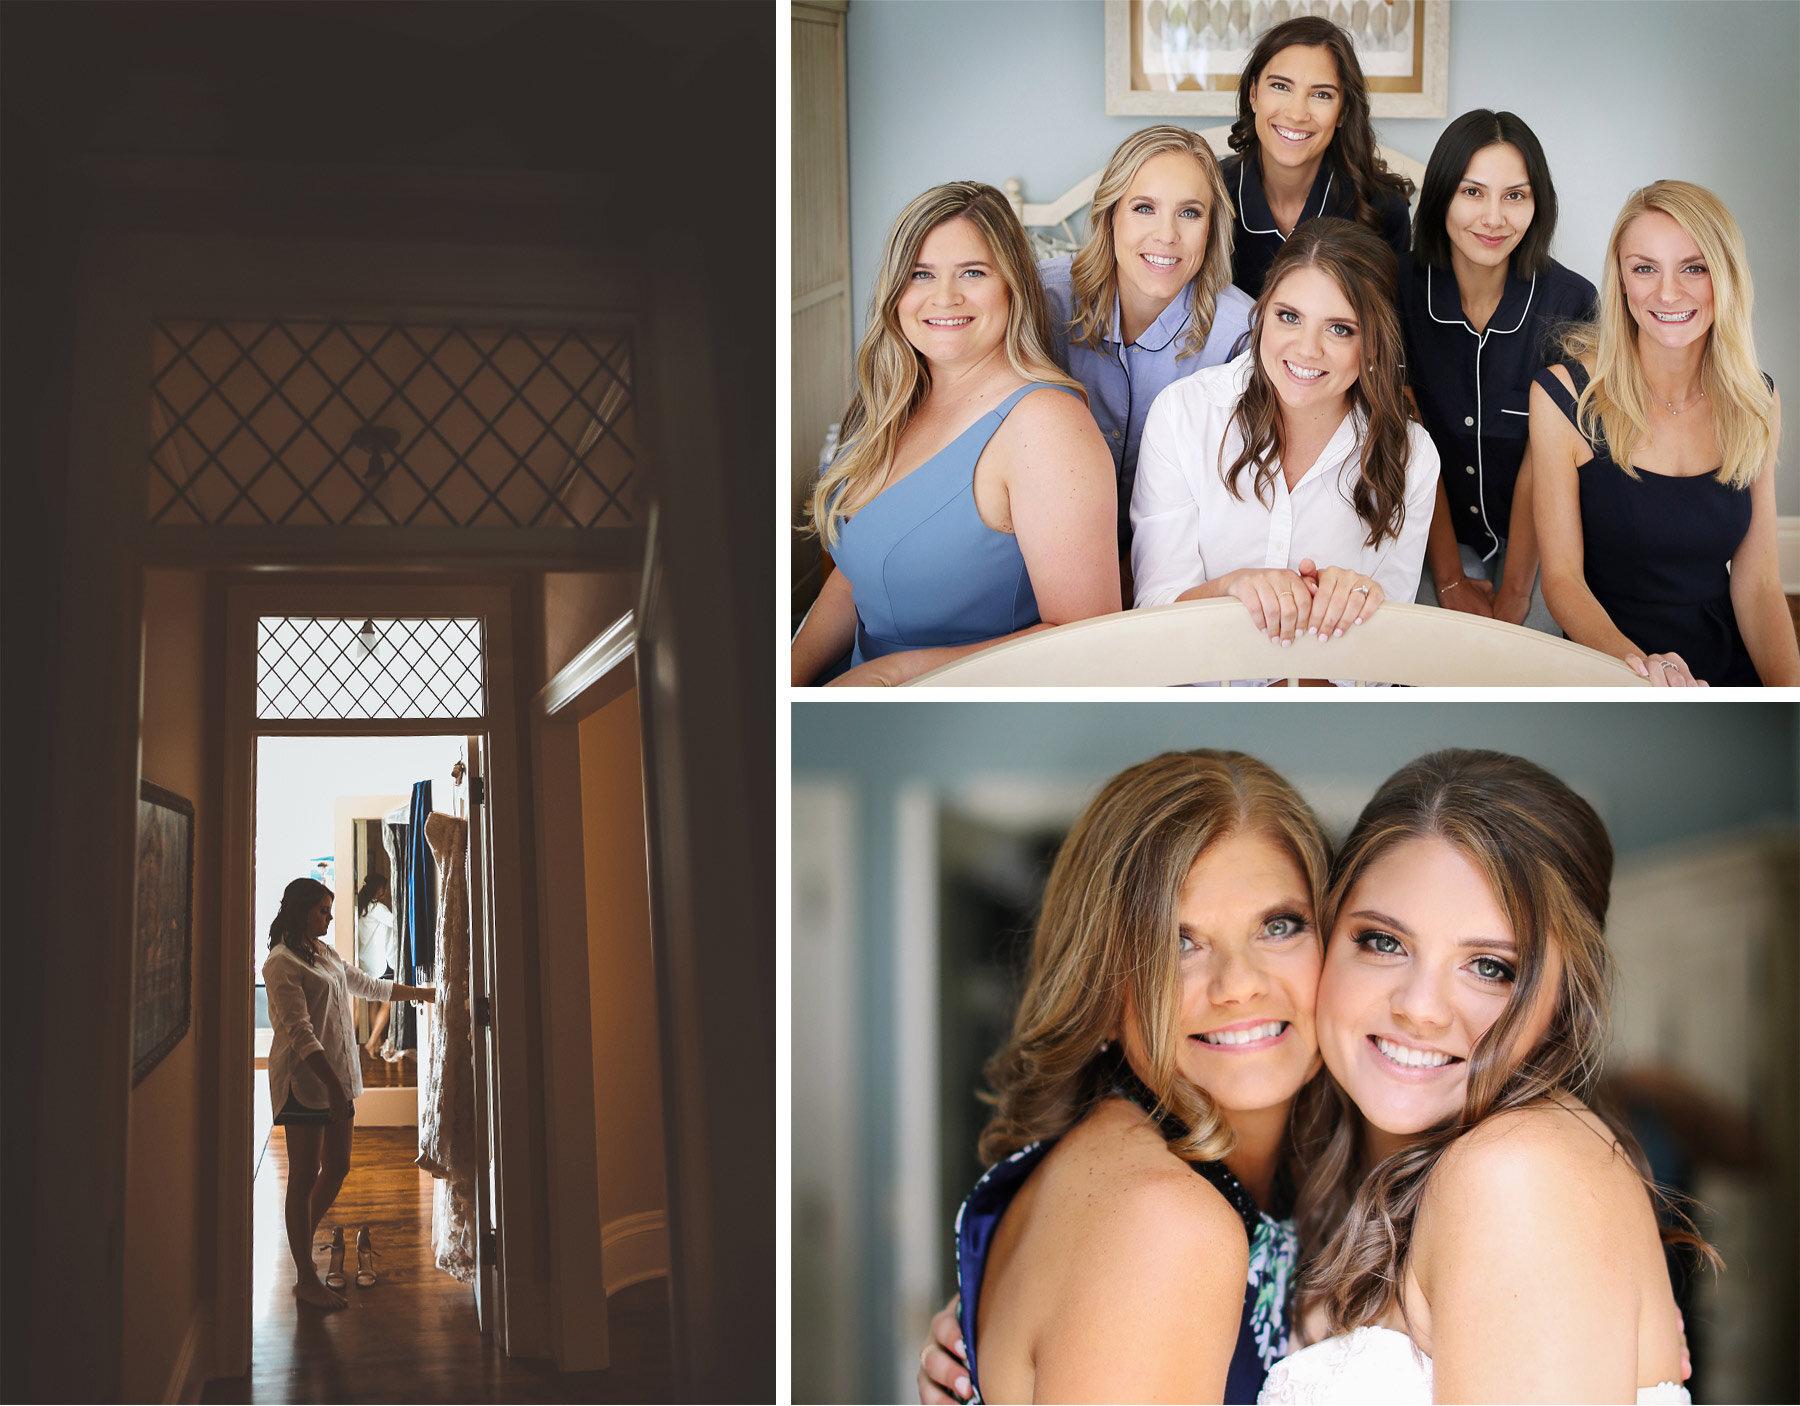 01-Vick-Photography-Wedding-Minnetonka-Minnesota-Family-Home-Mother-Bride-Katie-and-David.jpg